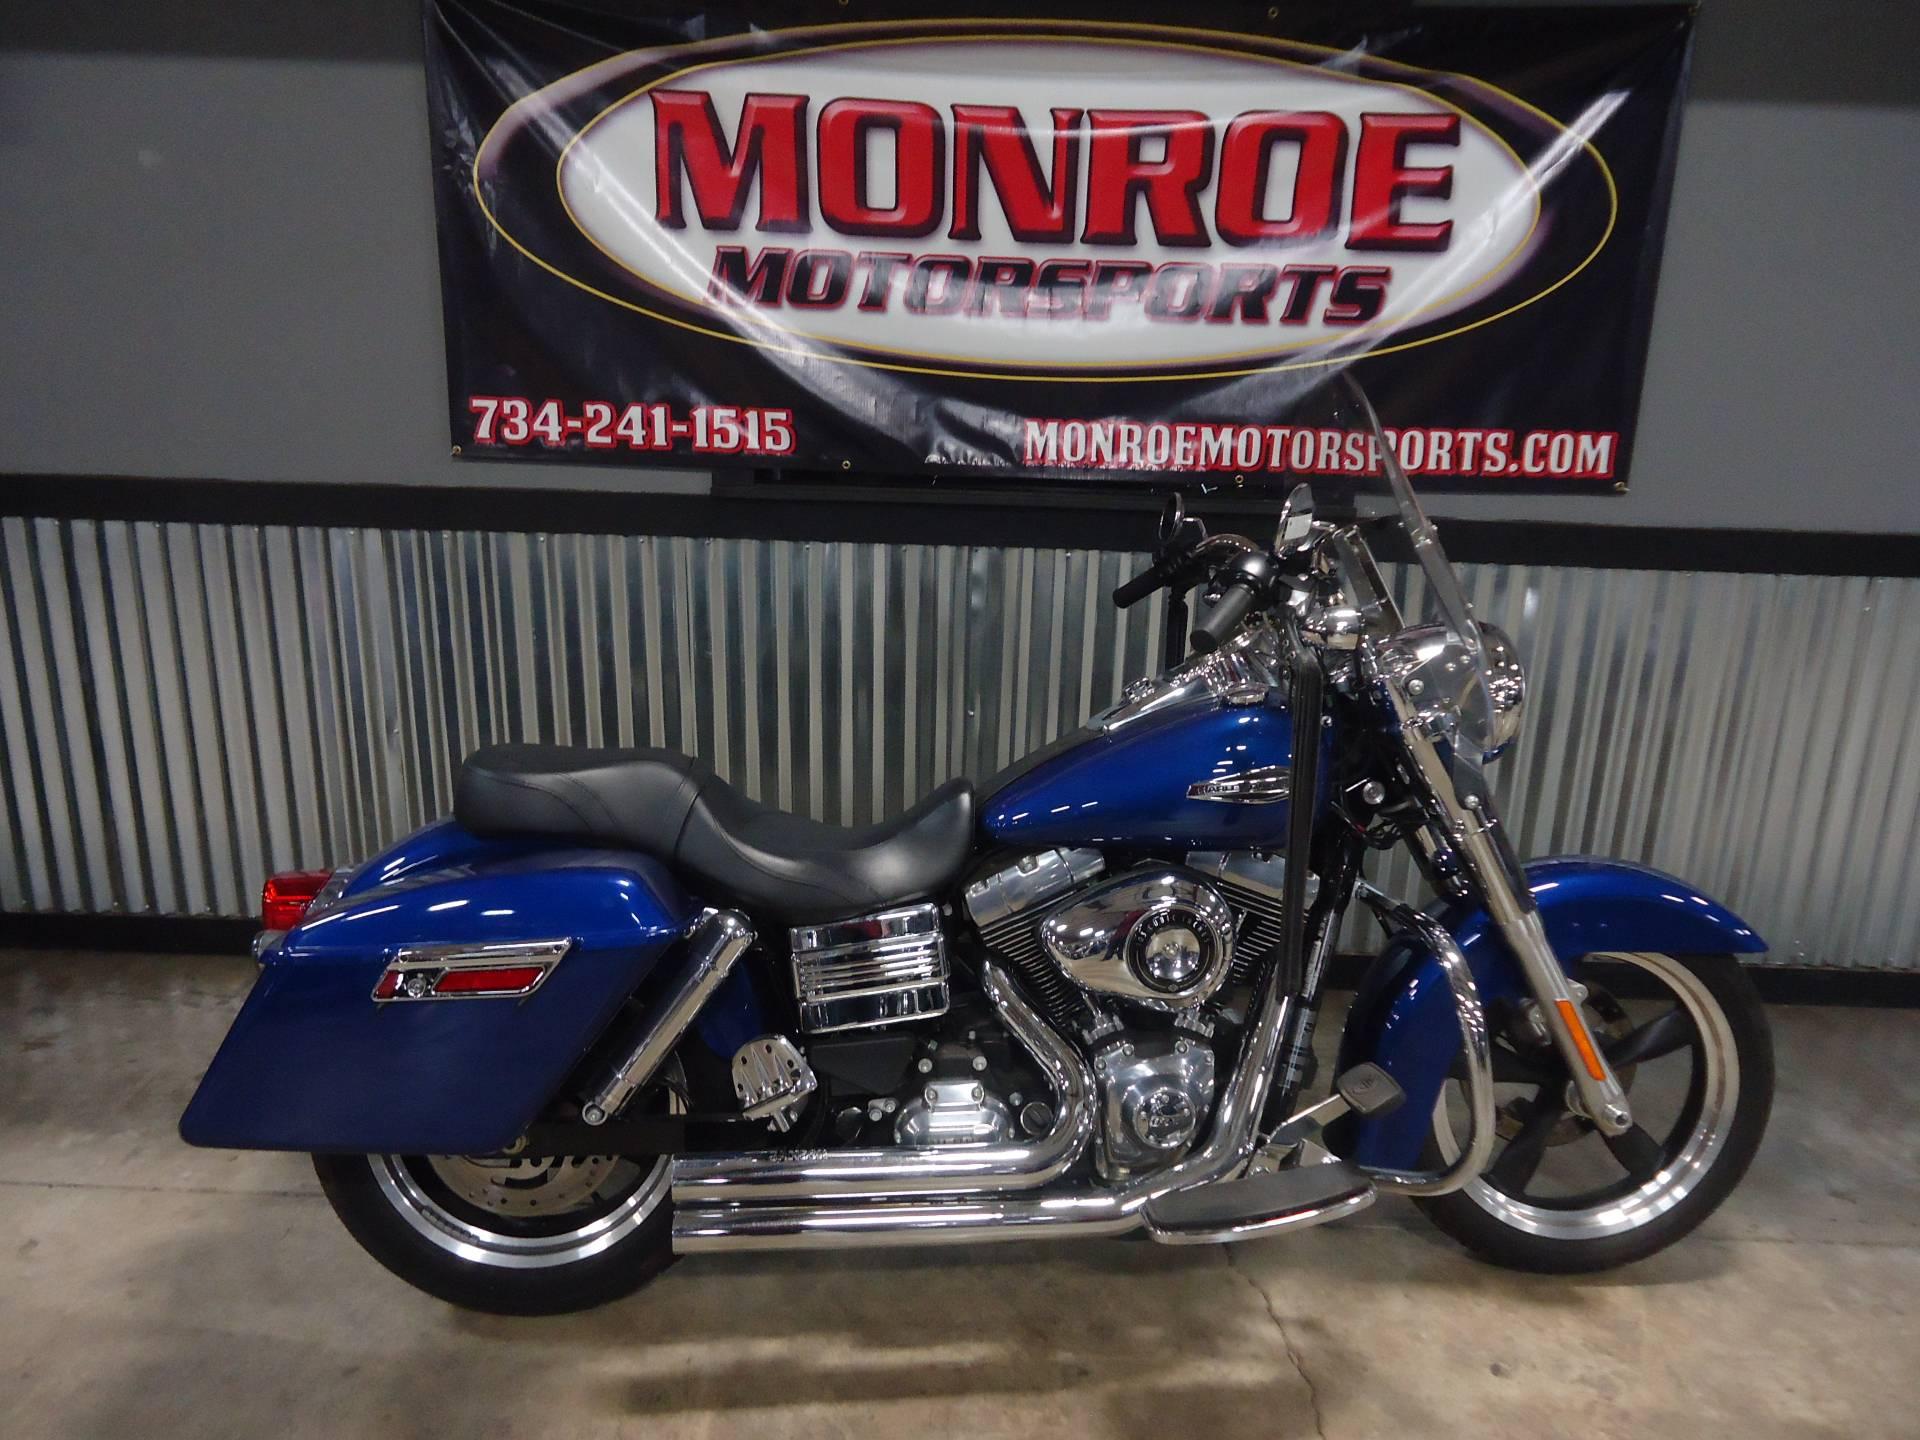 2015 Harley-Davidson Switchback™ Motorcycles Monroe Michigan HD317548